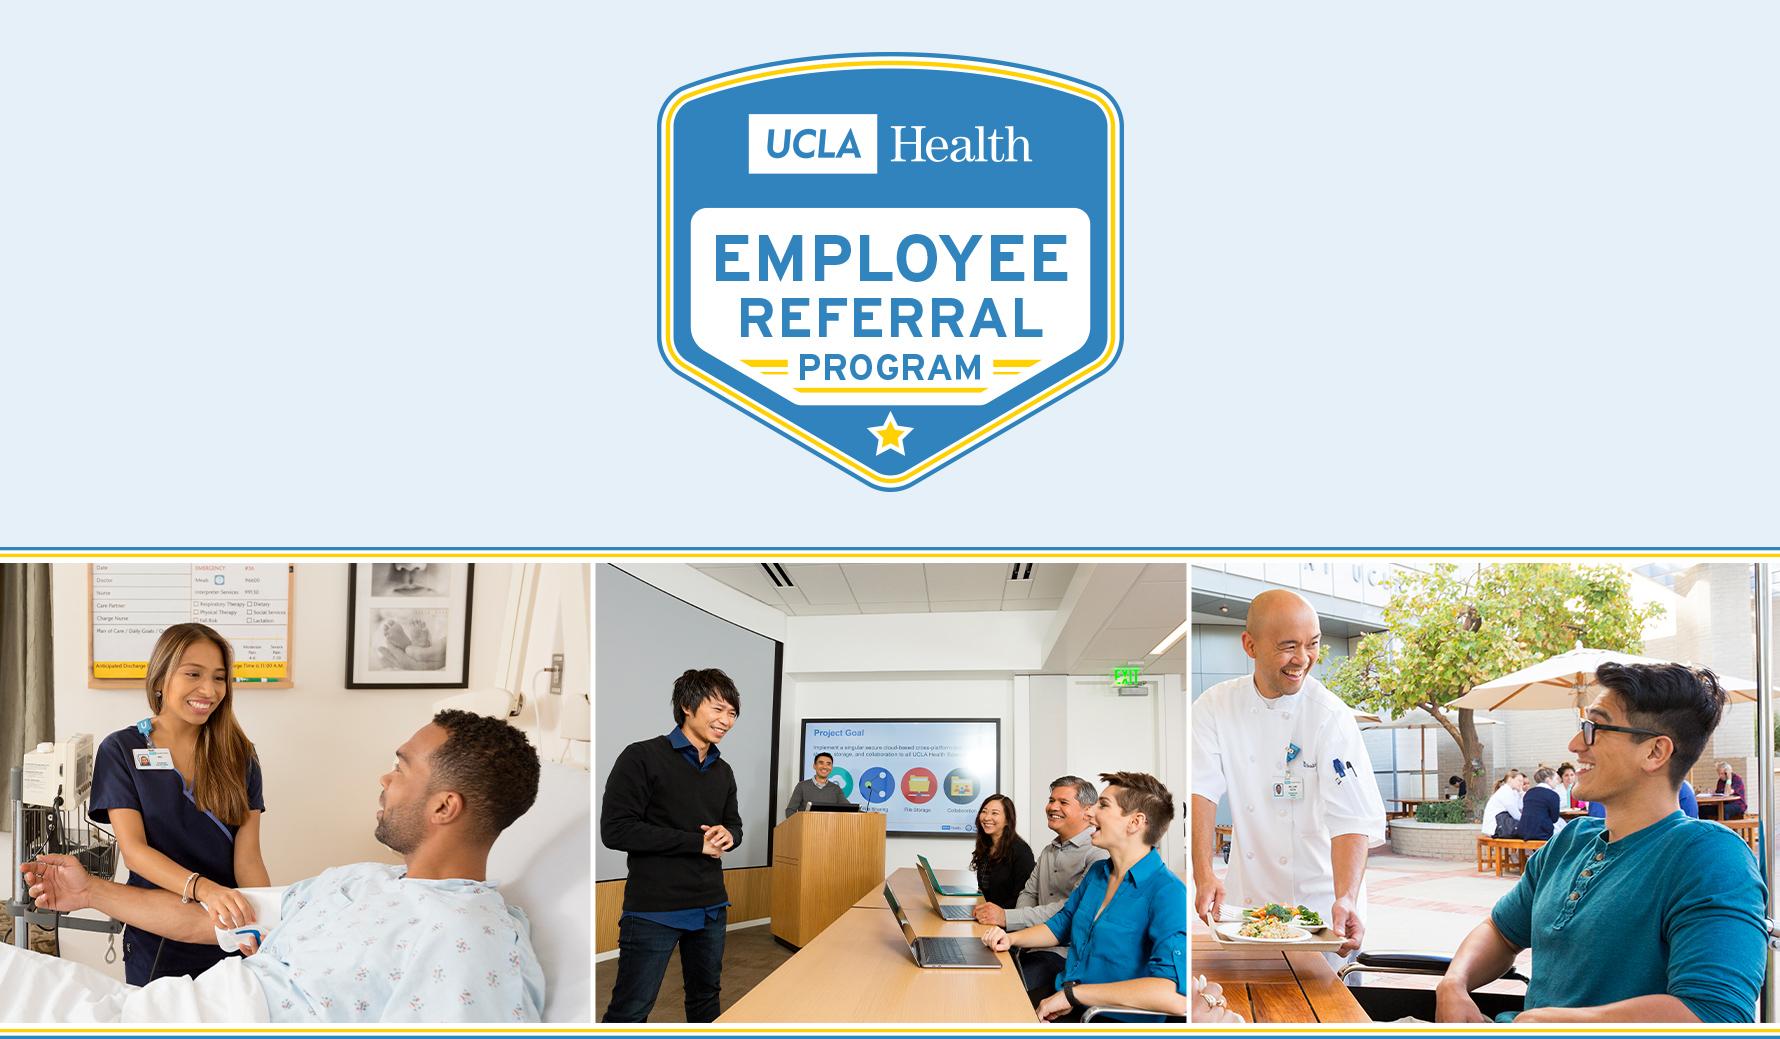 UCLA Health Employee Referral Program